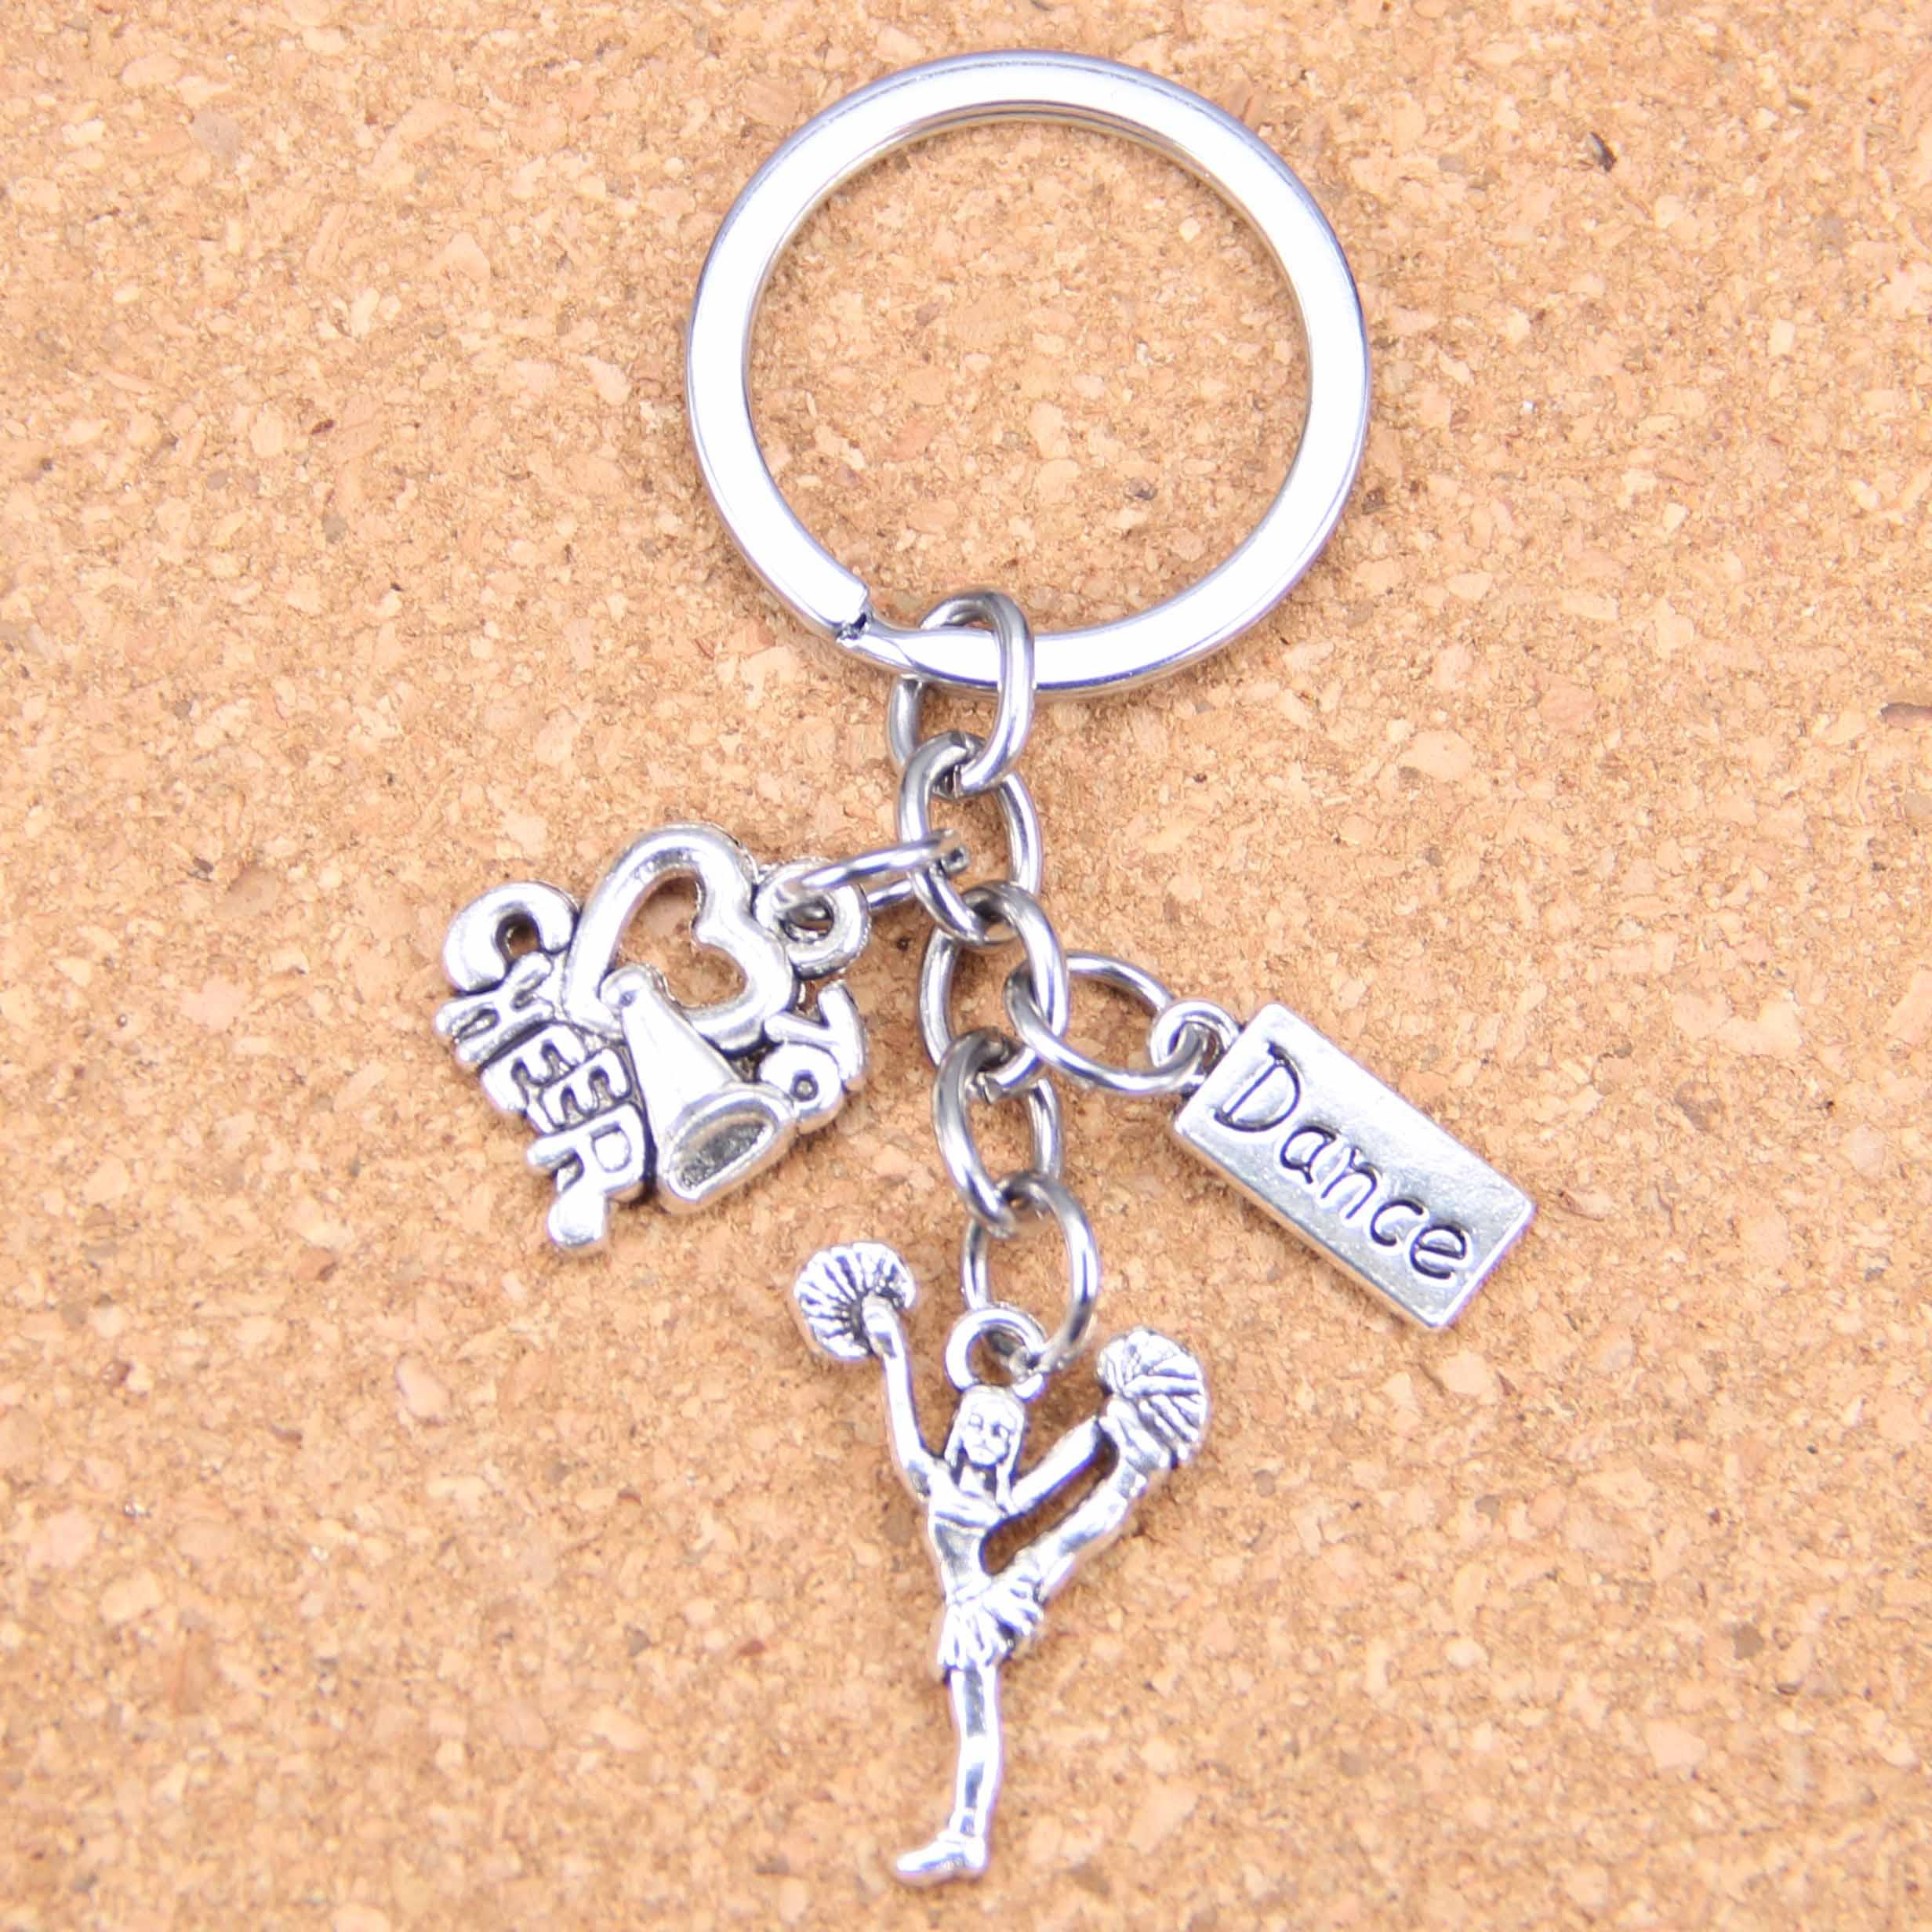 Objective 20pcs New Fashion Diy Keychain Cheerleaders Cheering Dance Pendants Men Jewelry Car Key Chain Souvenir For Gift